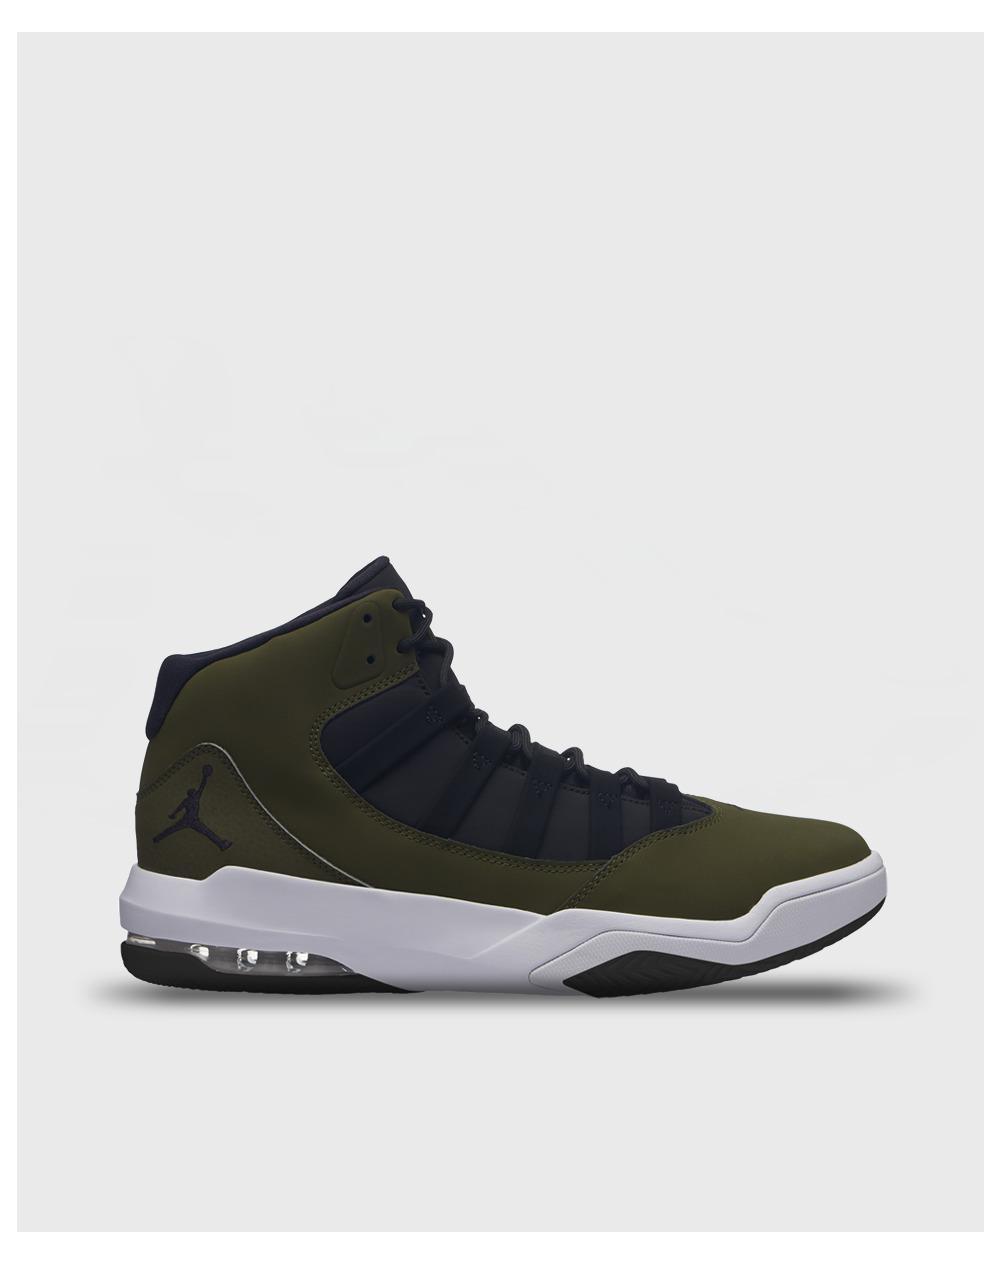 e90a2f308bb22a Nike Jordan Max Aura Casual Trainers in Green for Men - Lyst